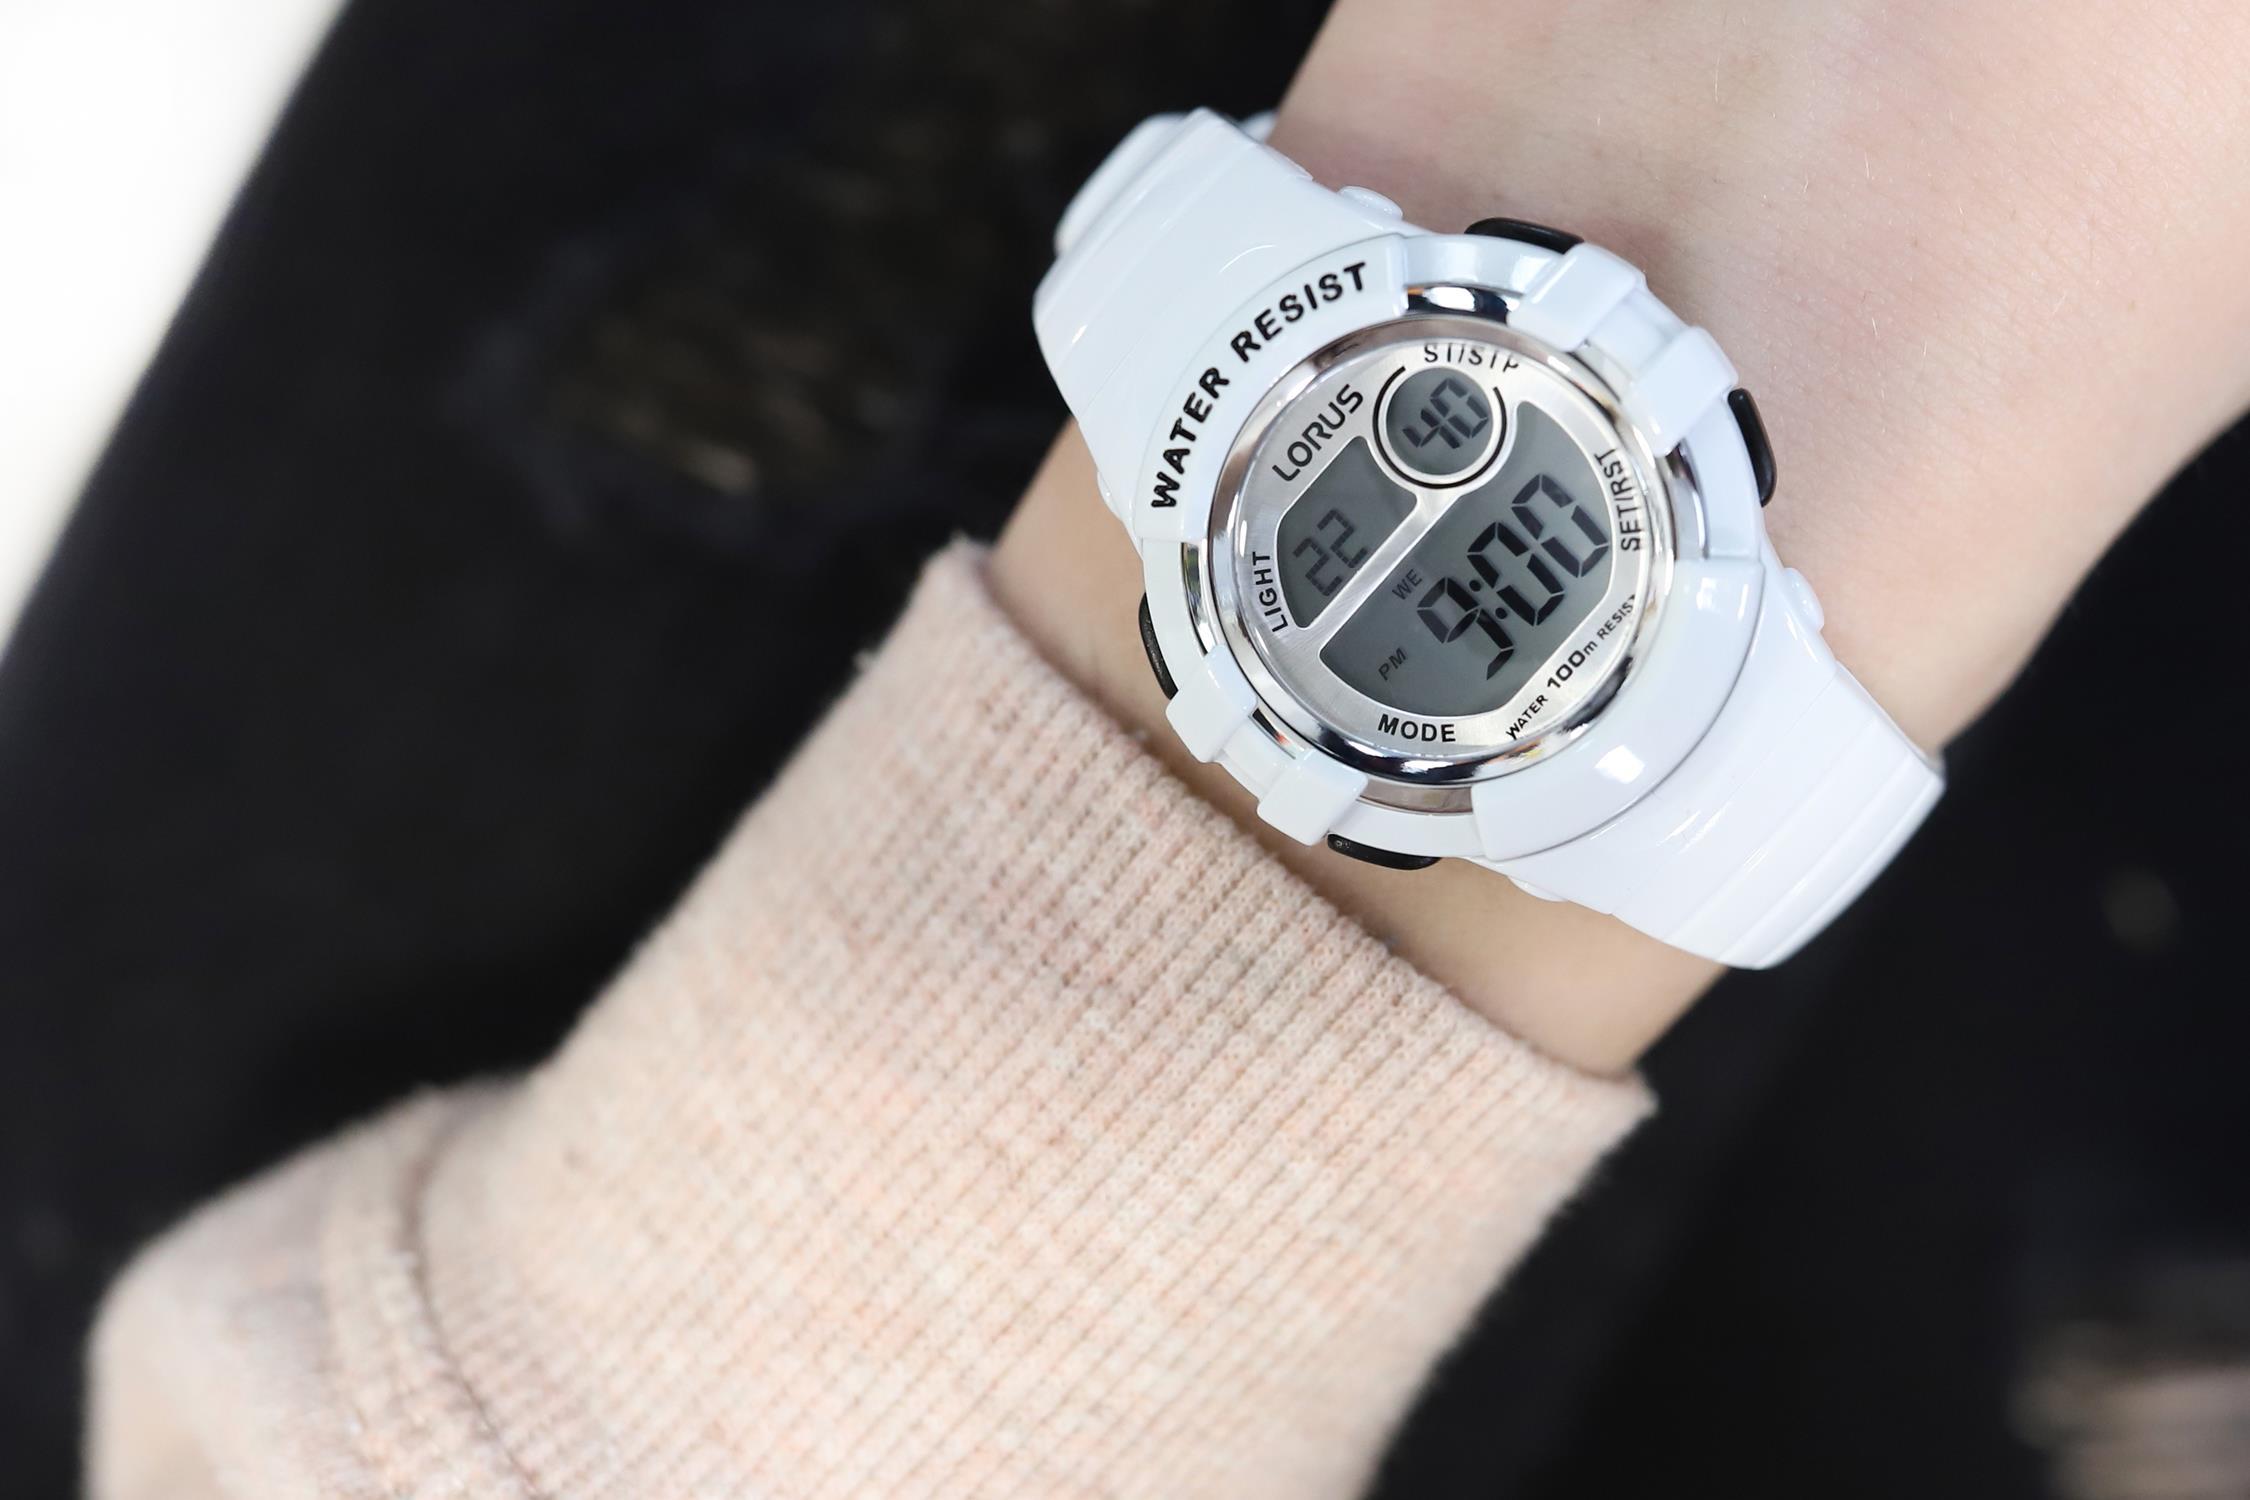 Zegarek damski Lorus sportowe R2383HX9 - duże 5